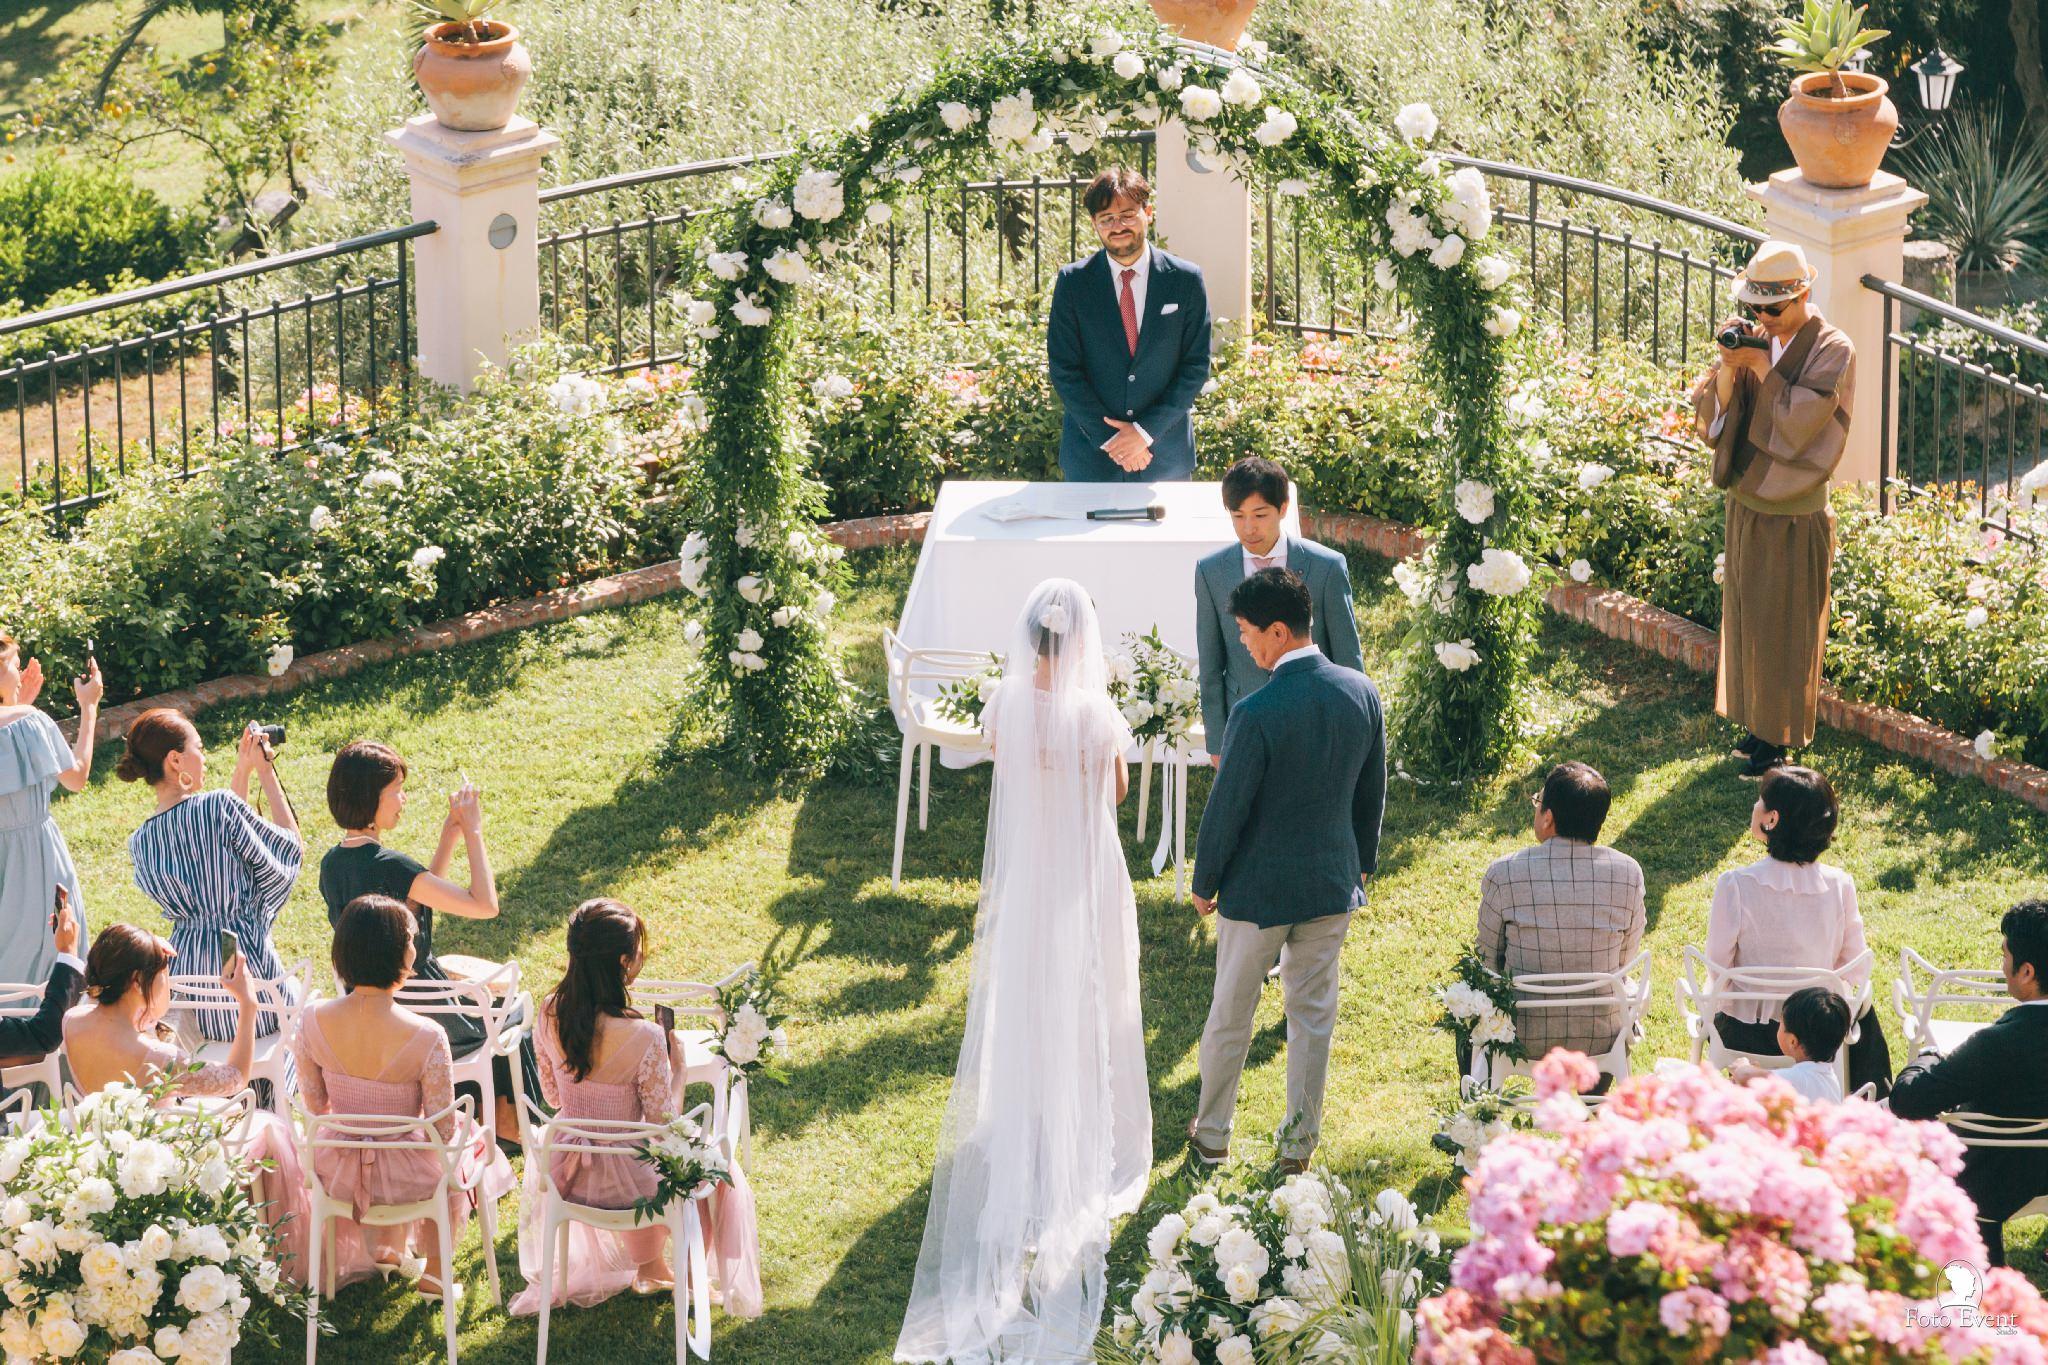 223-2019-06-14-Wedding-Yume-e-Makoto-Isee-7DL-248